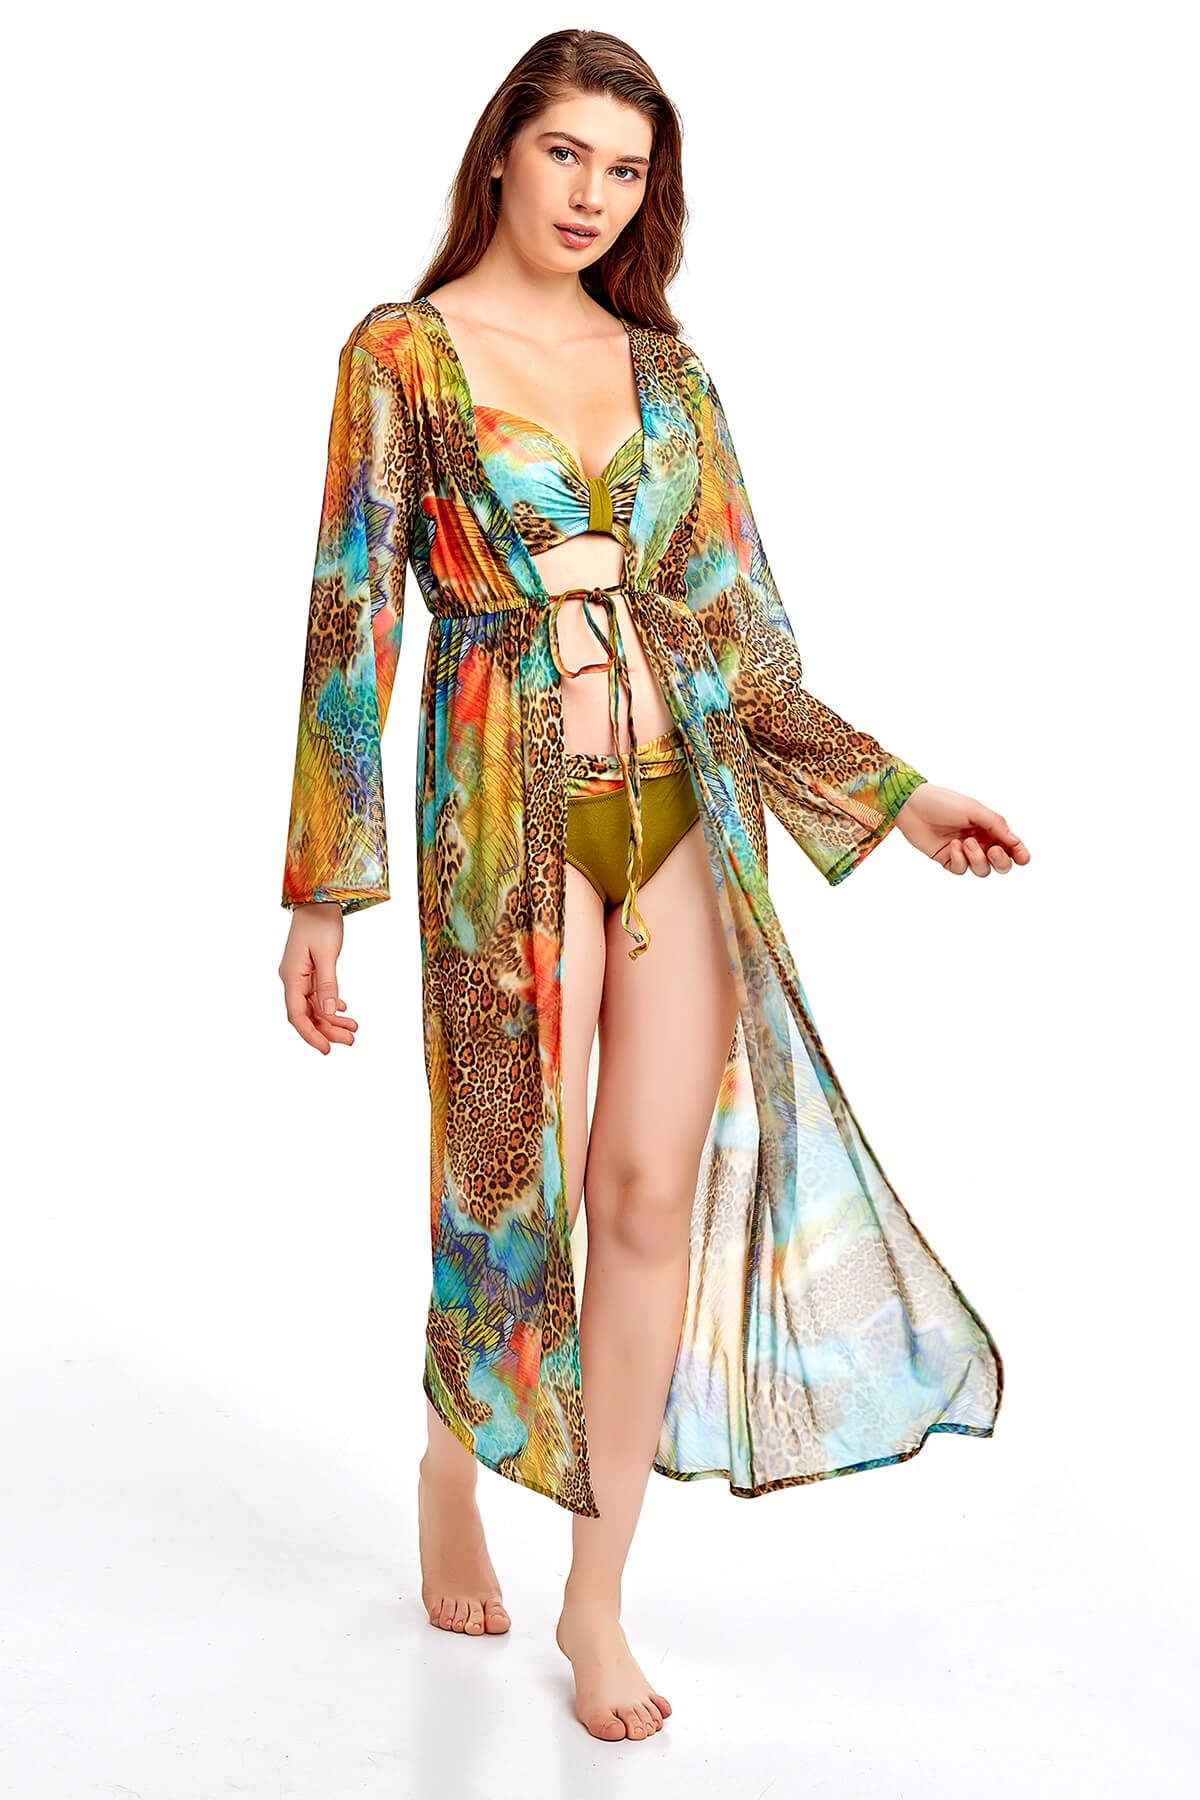 Oil Green Color Leopard Pattern Sexy Pareo For Women 2021 New Fashion Lightweight Beach Dress Very Elegant Pool Wear